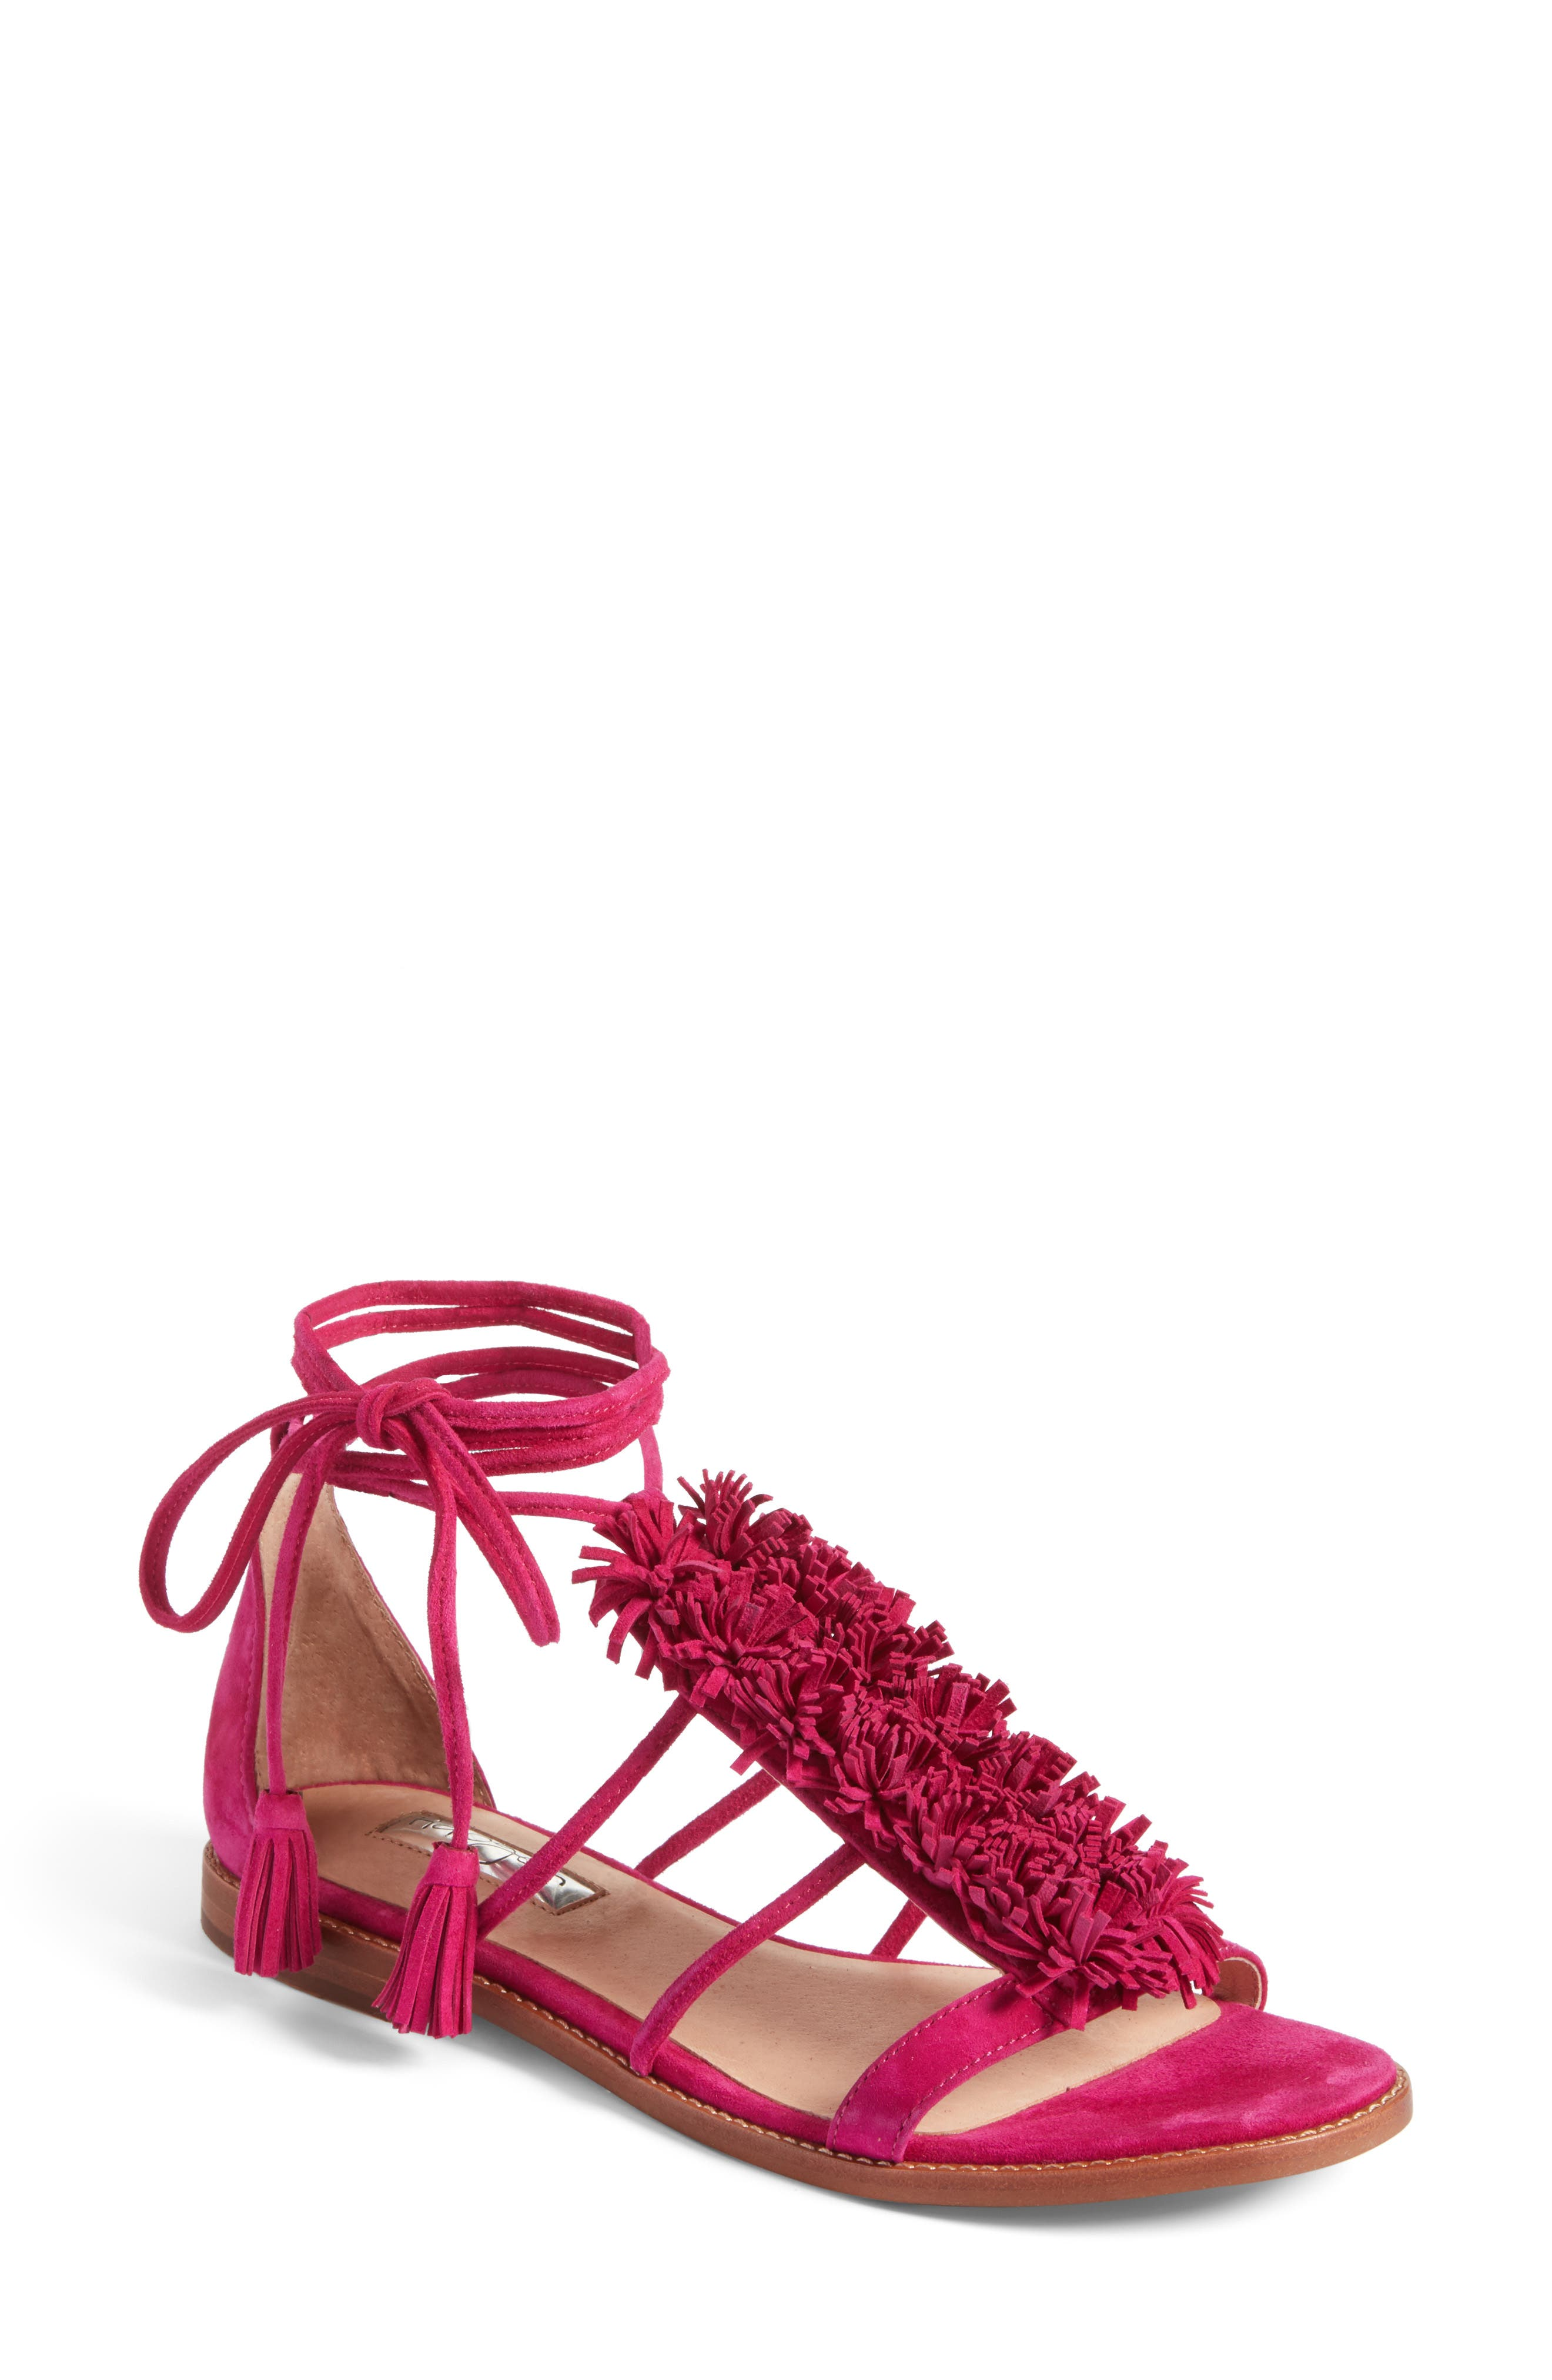 Main Image - Halogen® Eliza Flat Sandal (Women)